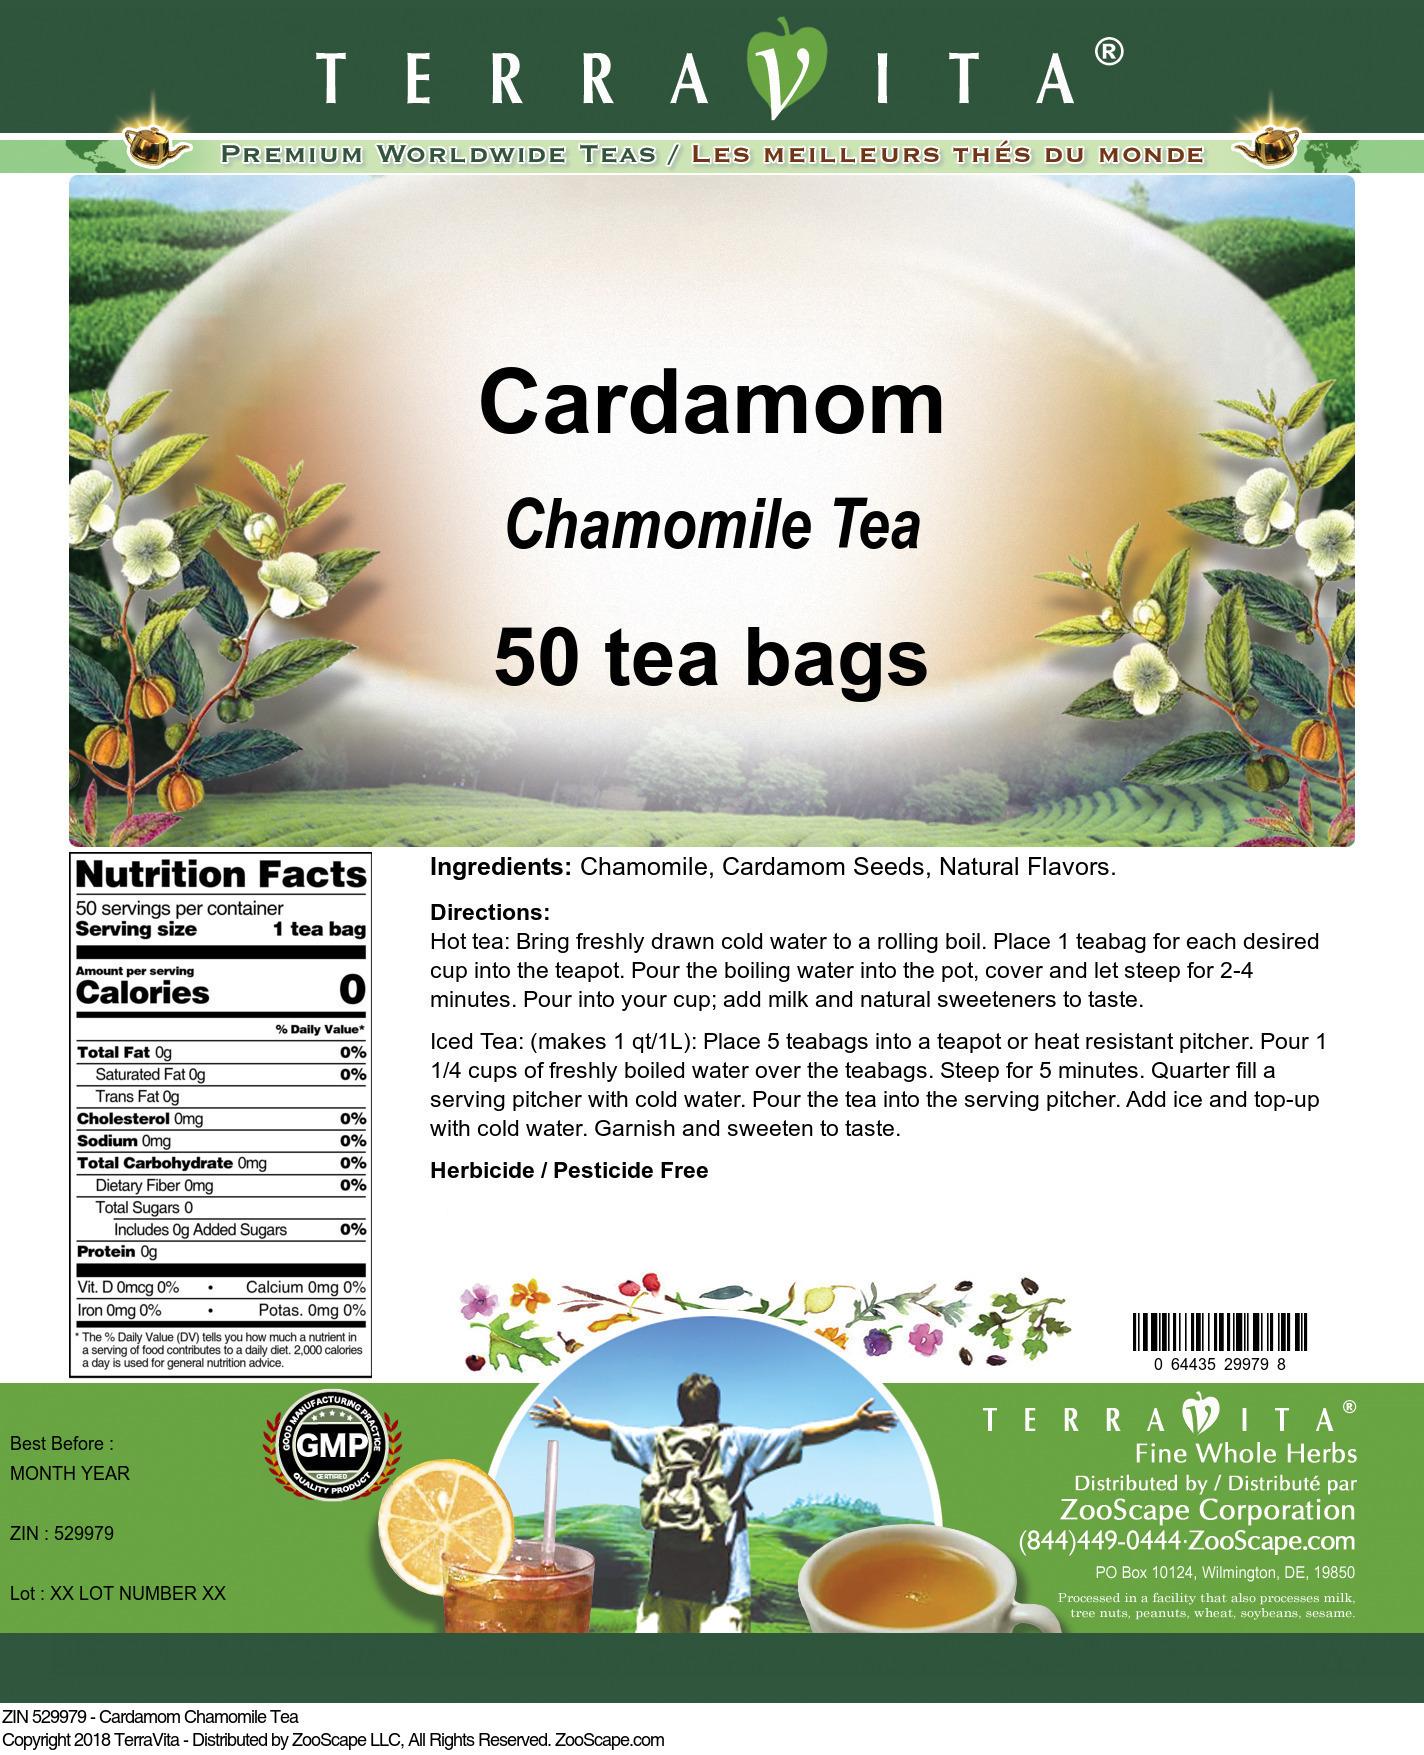 Cardamom Chamomile Tea